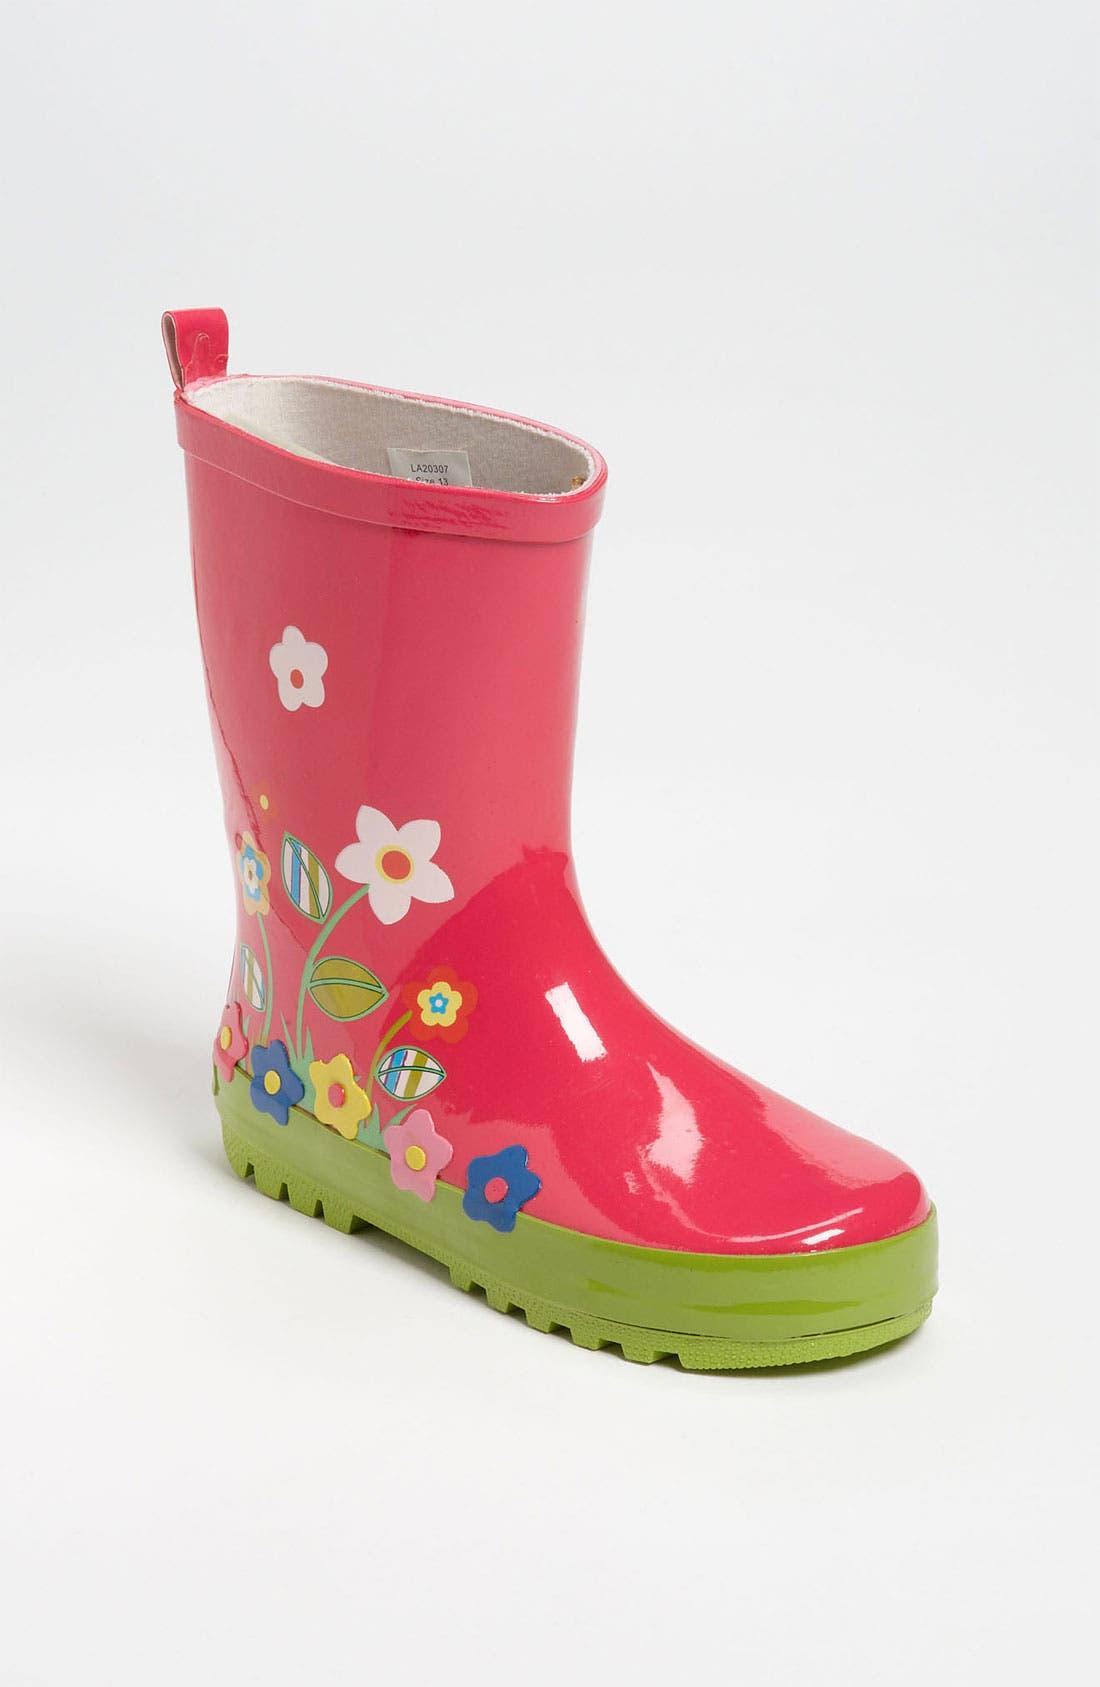 Alternate Image 1 Selected - Laura Ashley 'Garden' Rain Boot (Walker, Toddler, Little Kid & Big Kid)